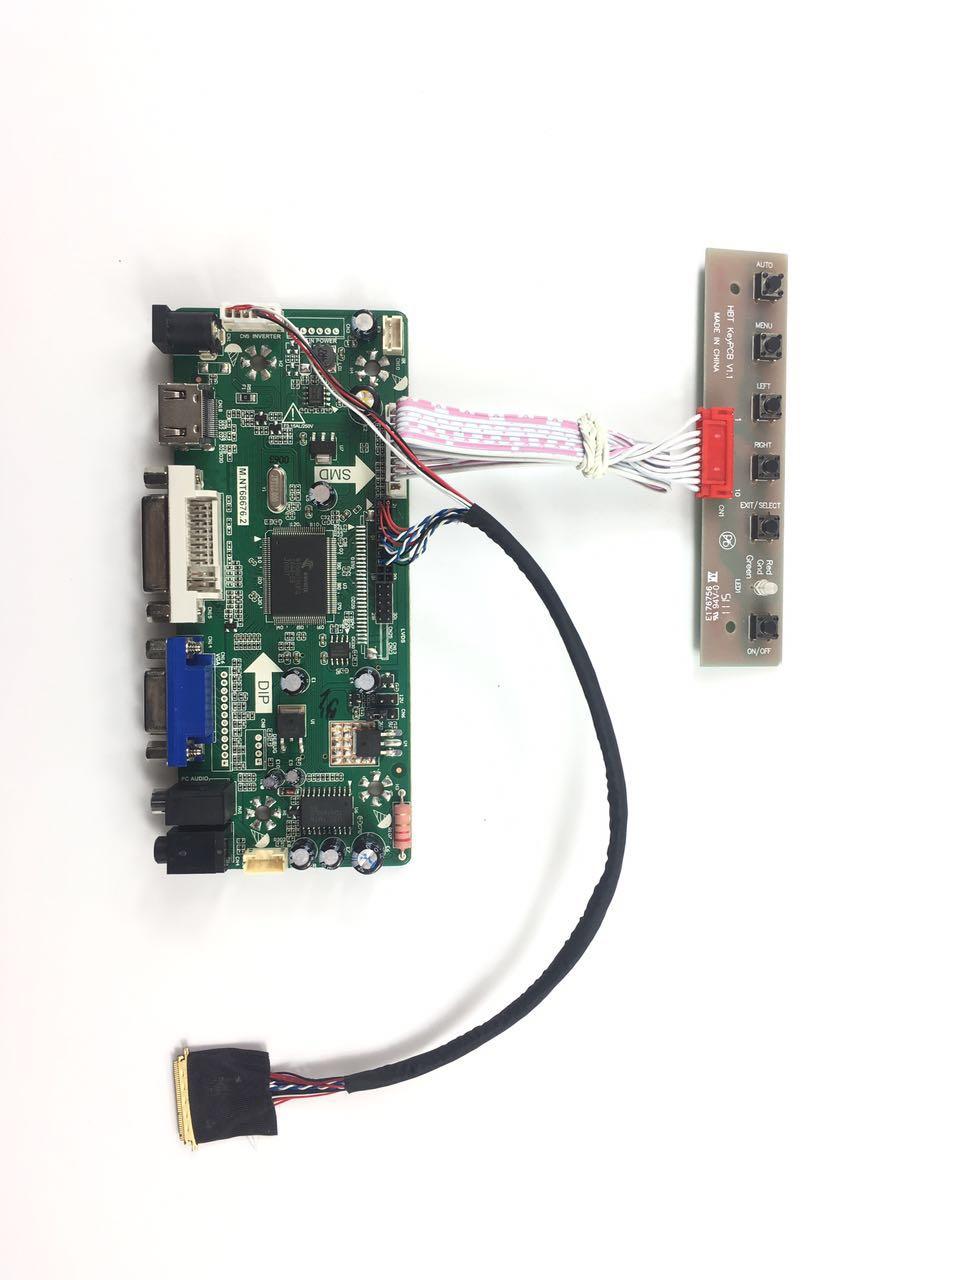 Free Shipping NT68676 VGA DVI HDMI LCD Controller Board DIY Kit for B156XW02 V0 V3 V5 V7 15.6 inch 1366x768 LVDS LCD panel<br>